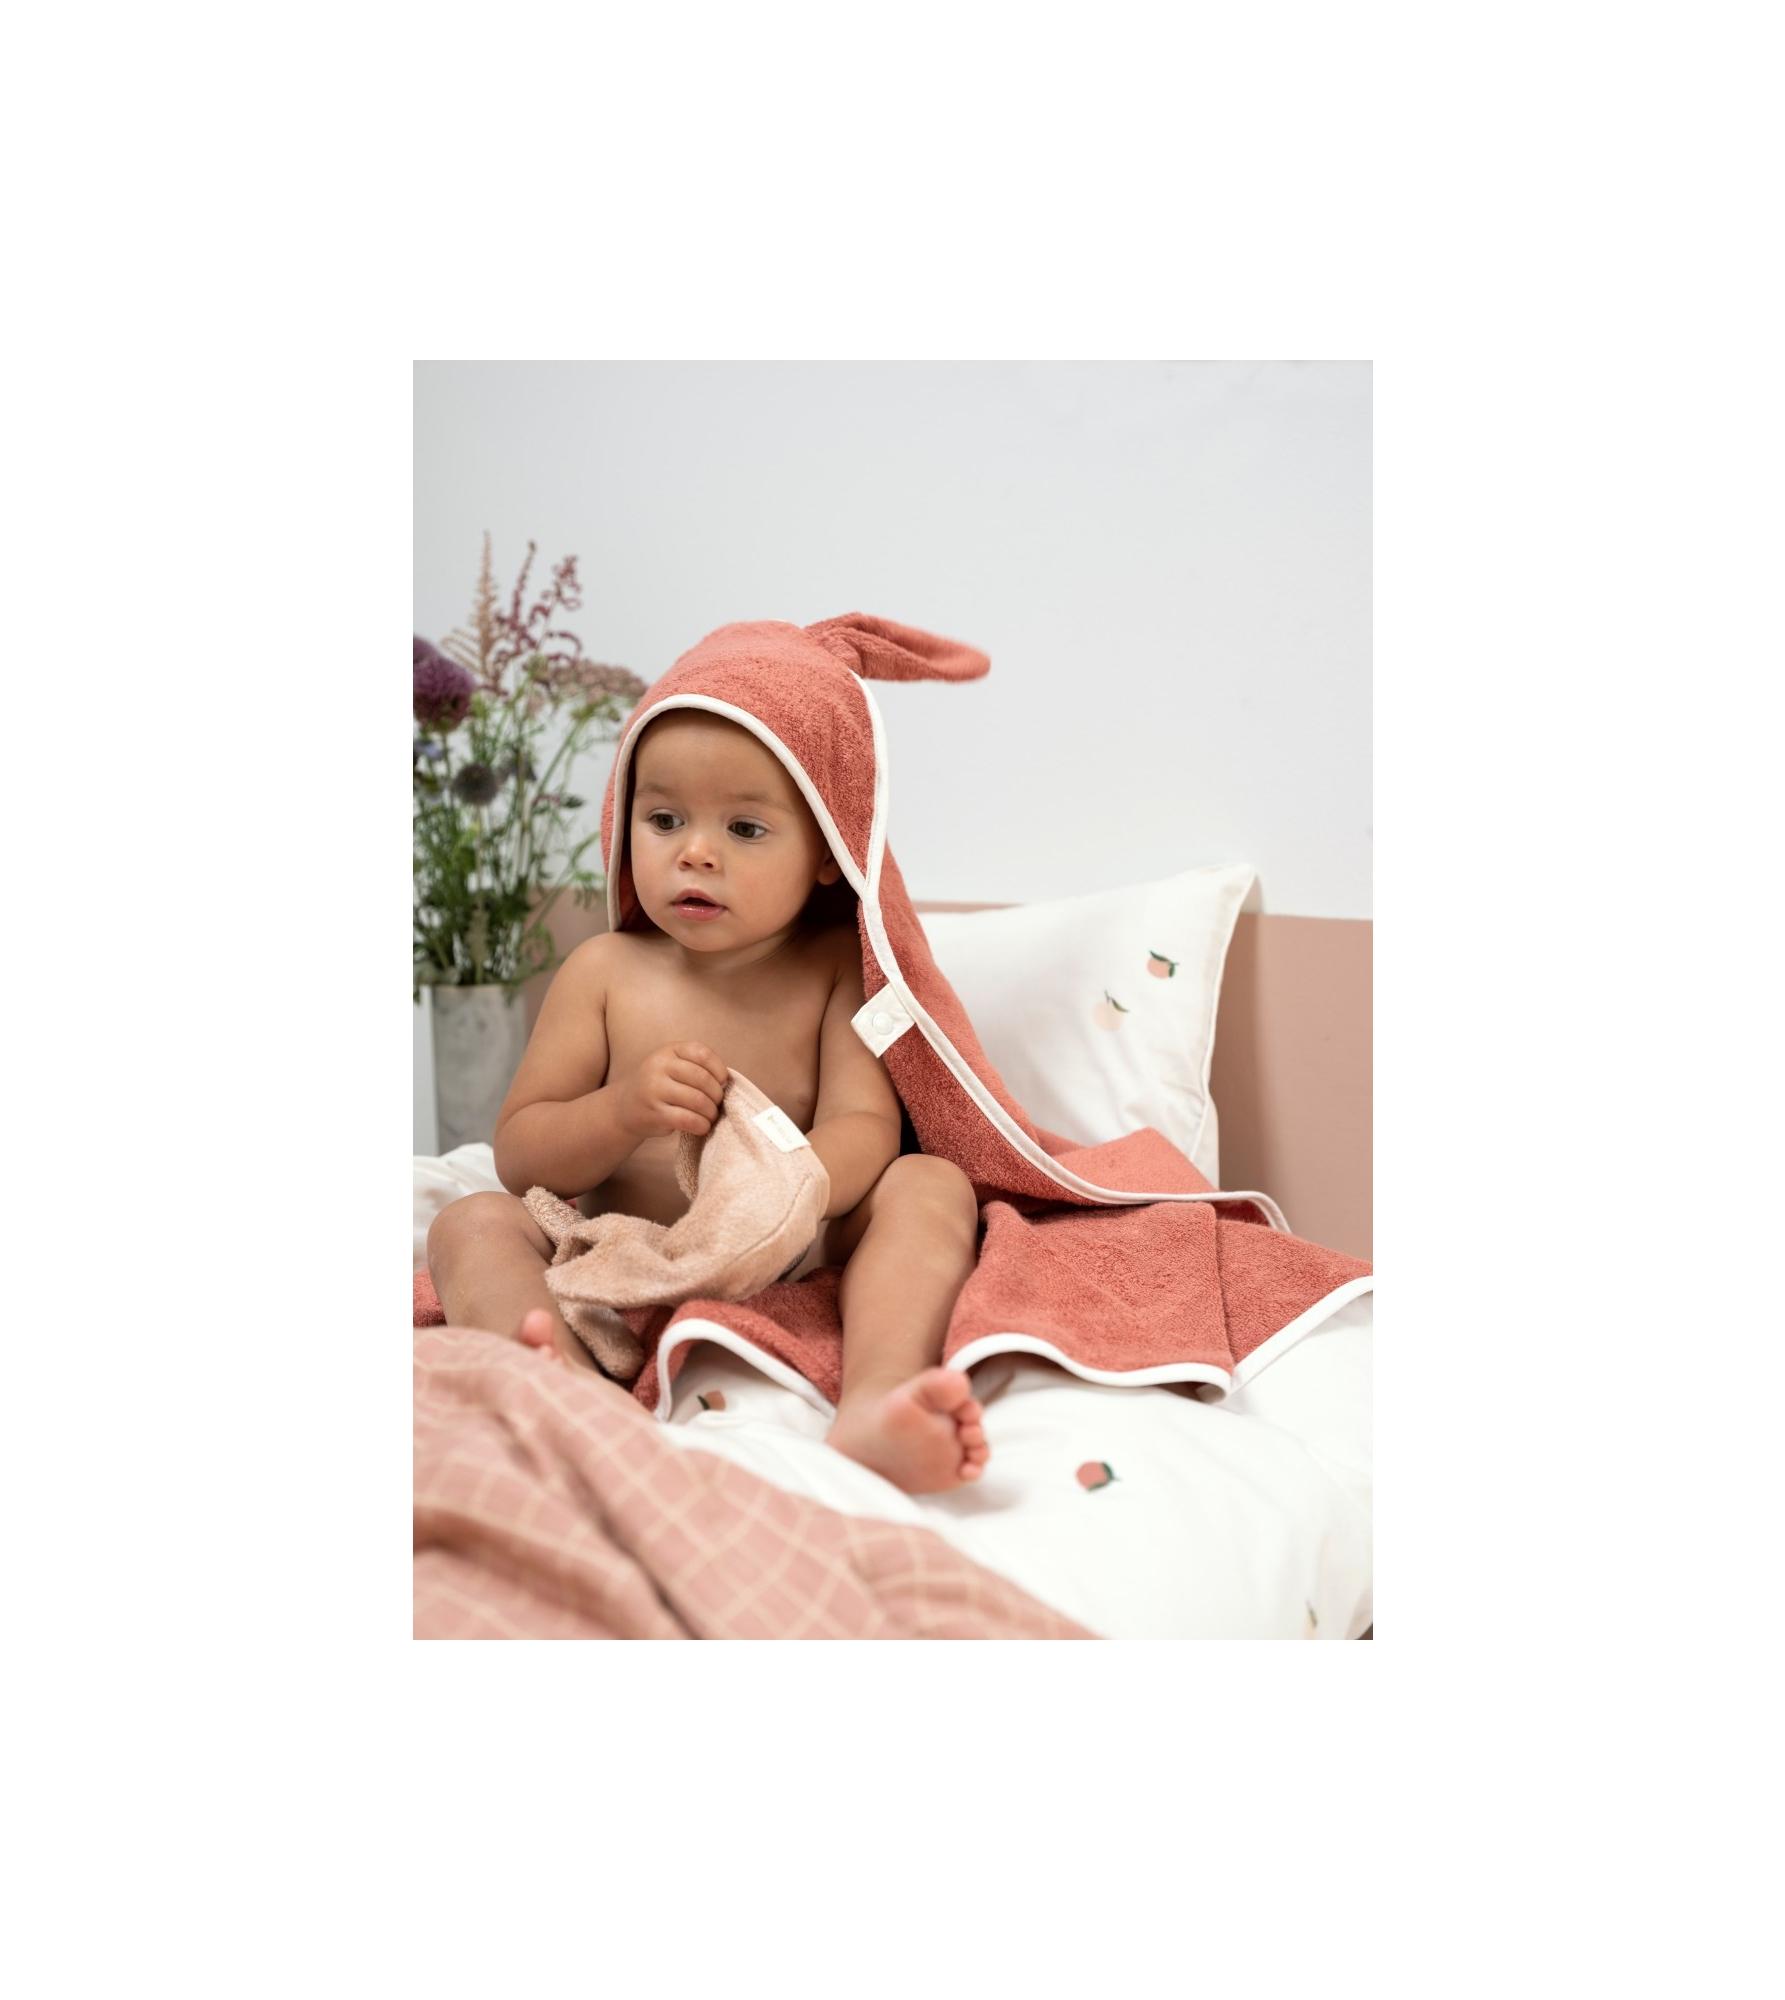 Hooded Baby Towel - Bunny - Clay 2_edit.jpg